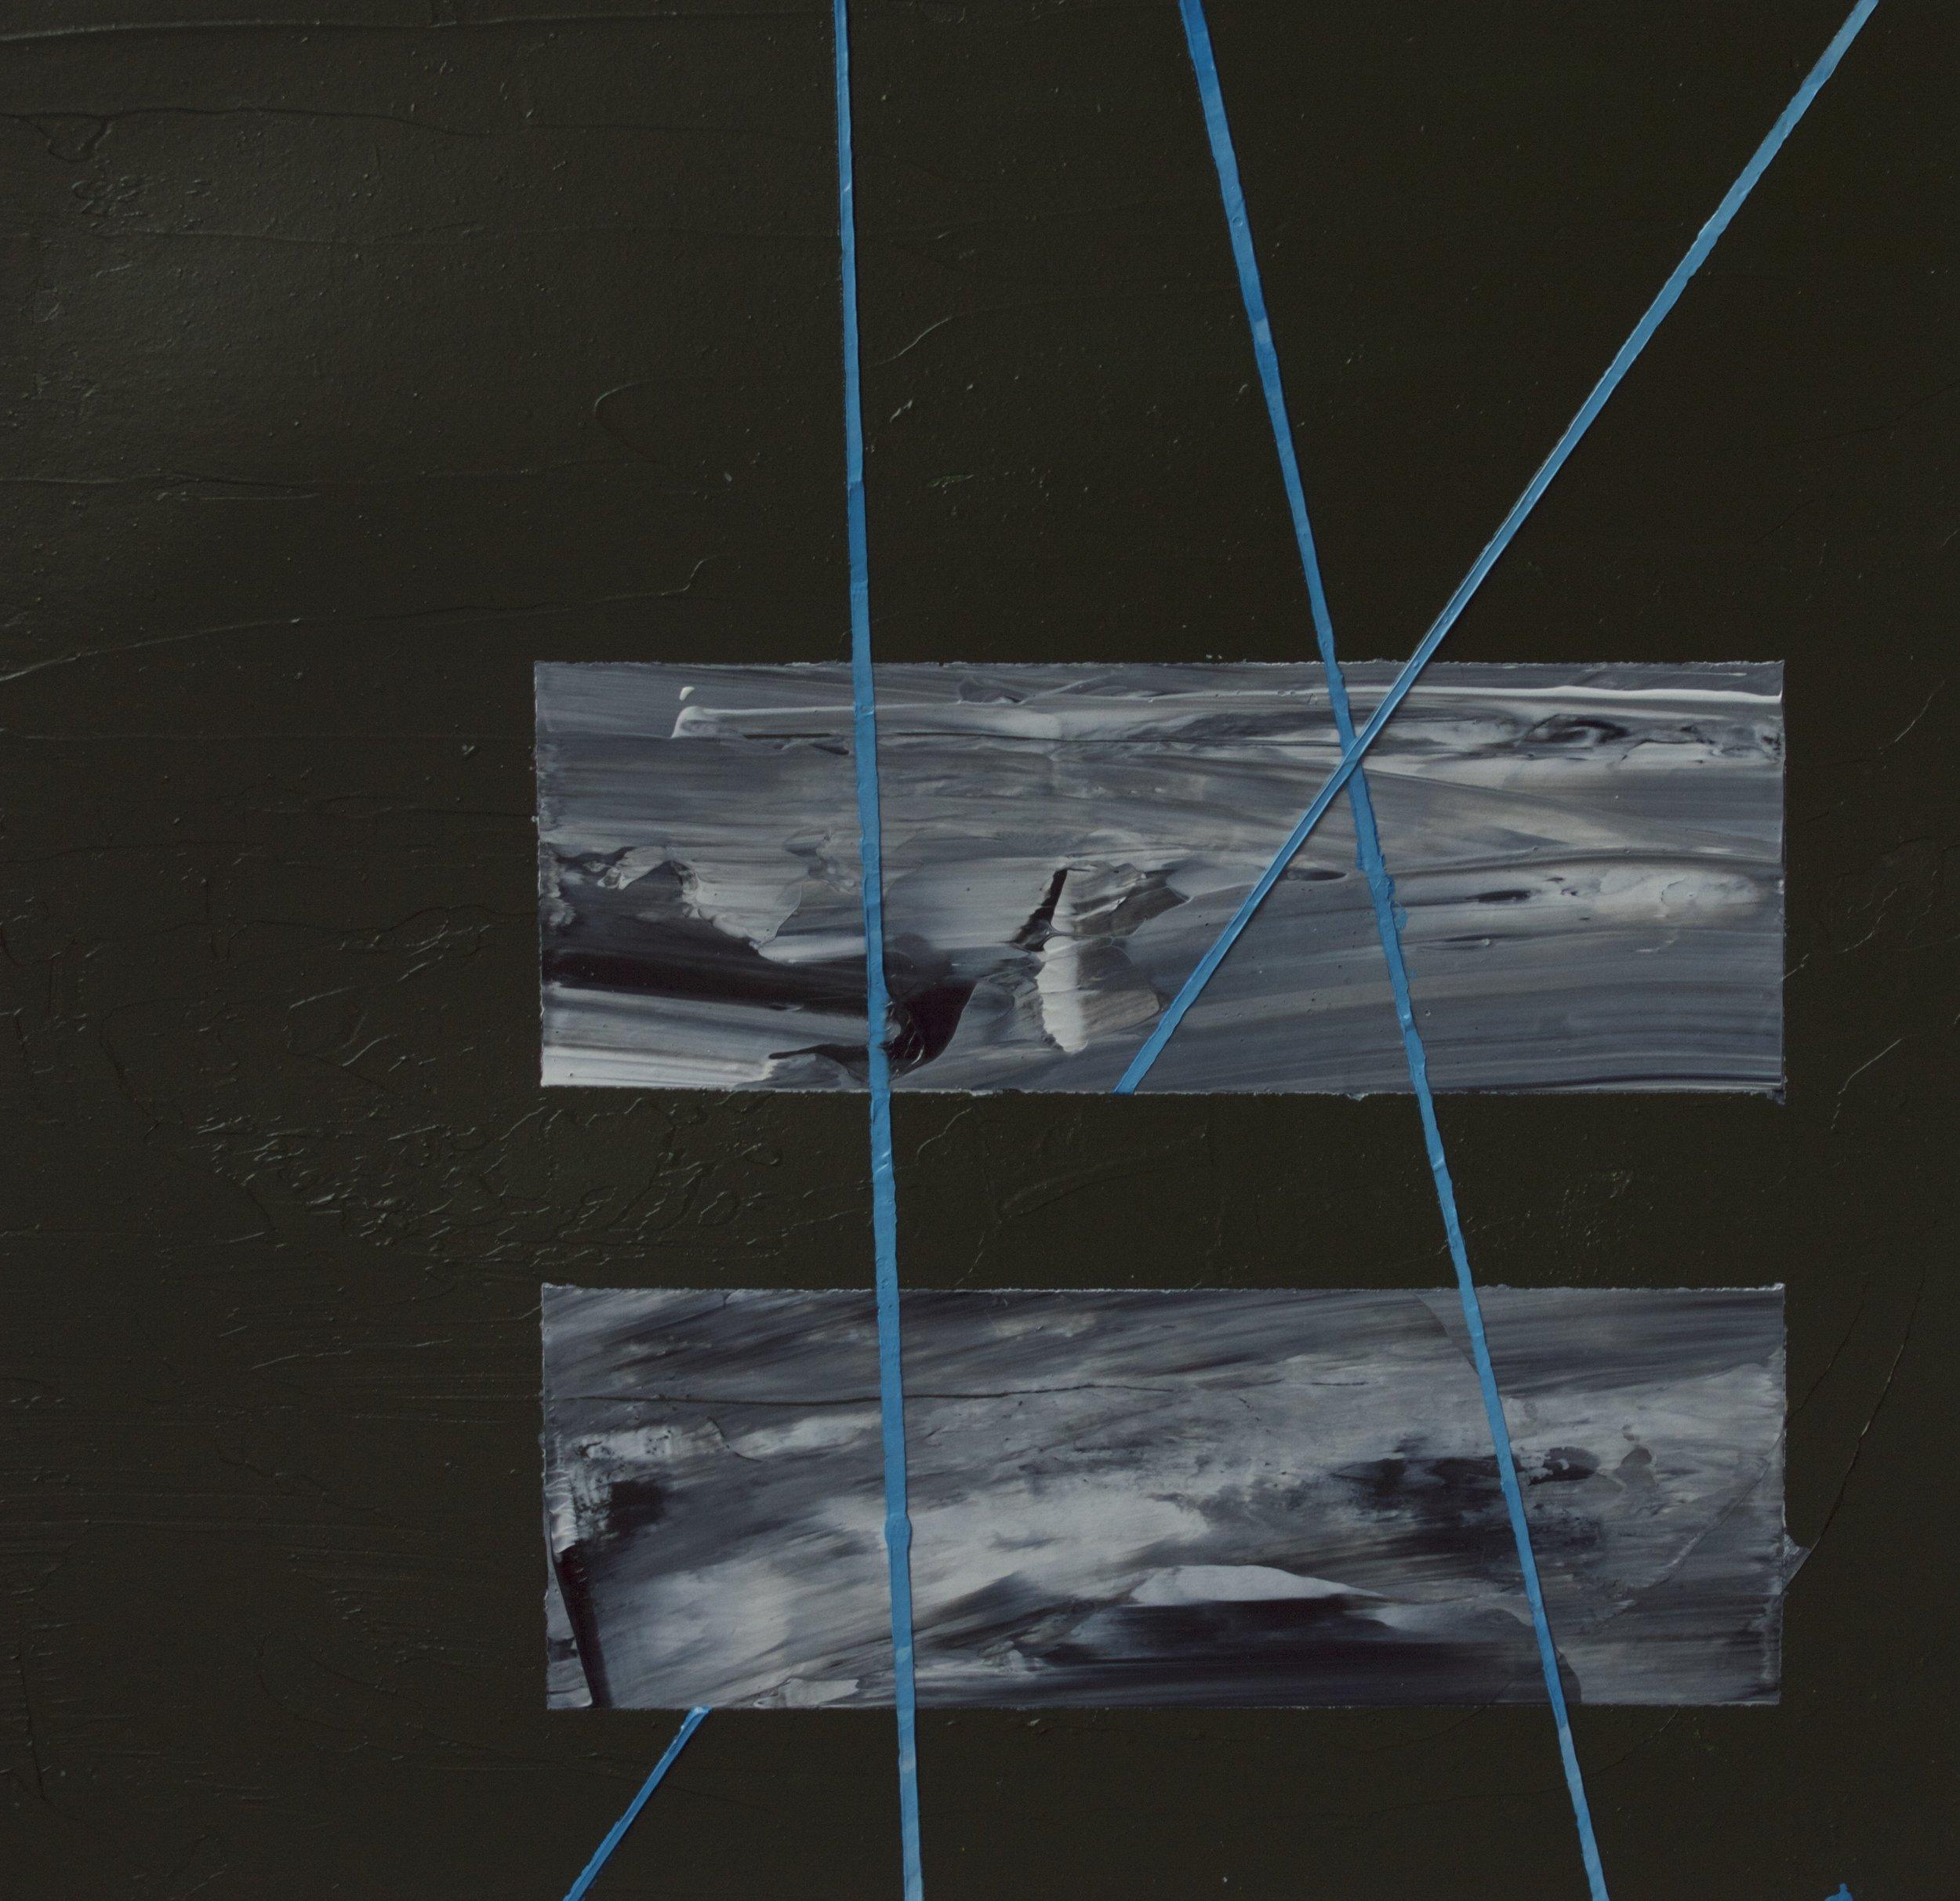 3 Blue Lines